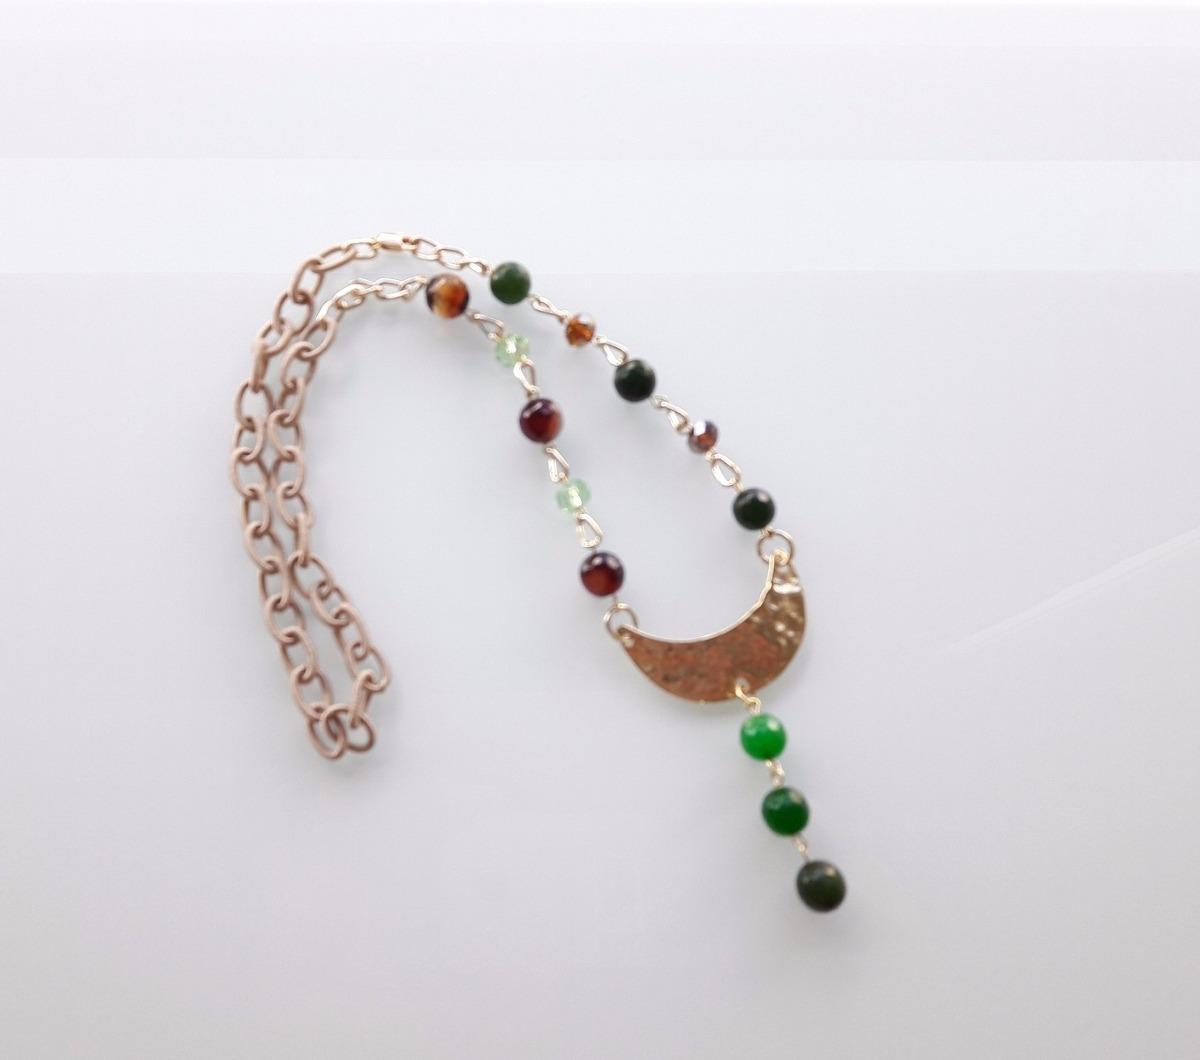 fe7e157ee7a5 collar piedras semi preciosa-mujer bisuteria accesorios a m. Cargando zoom.